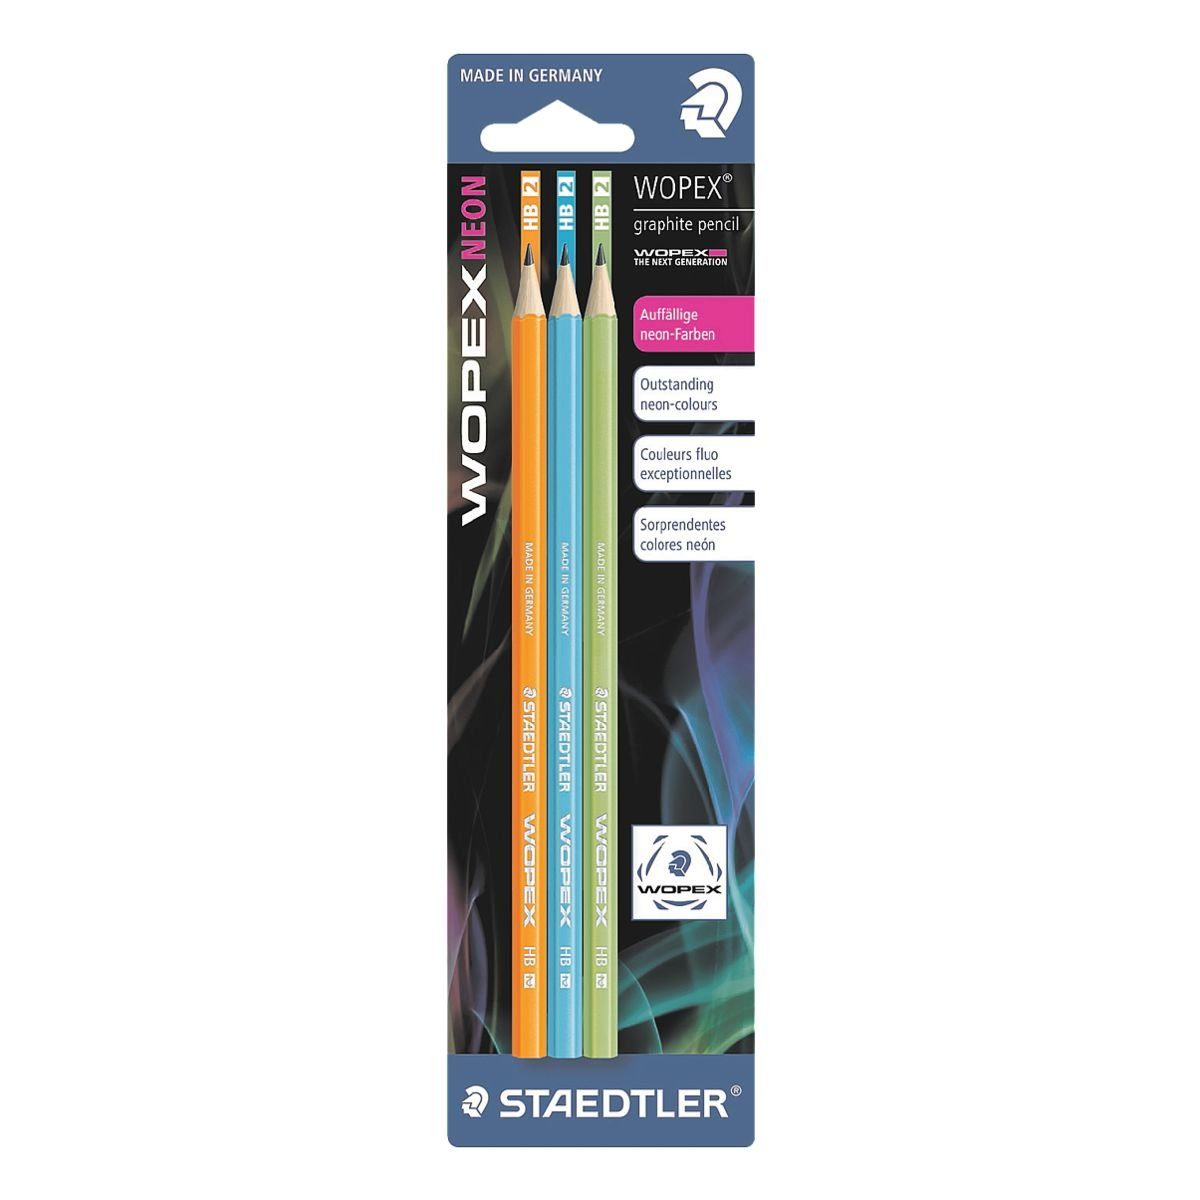 Staedtler 3er-Pack Bleistifte »Wopex«